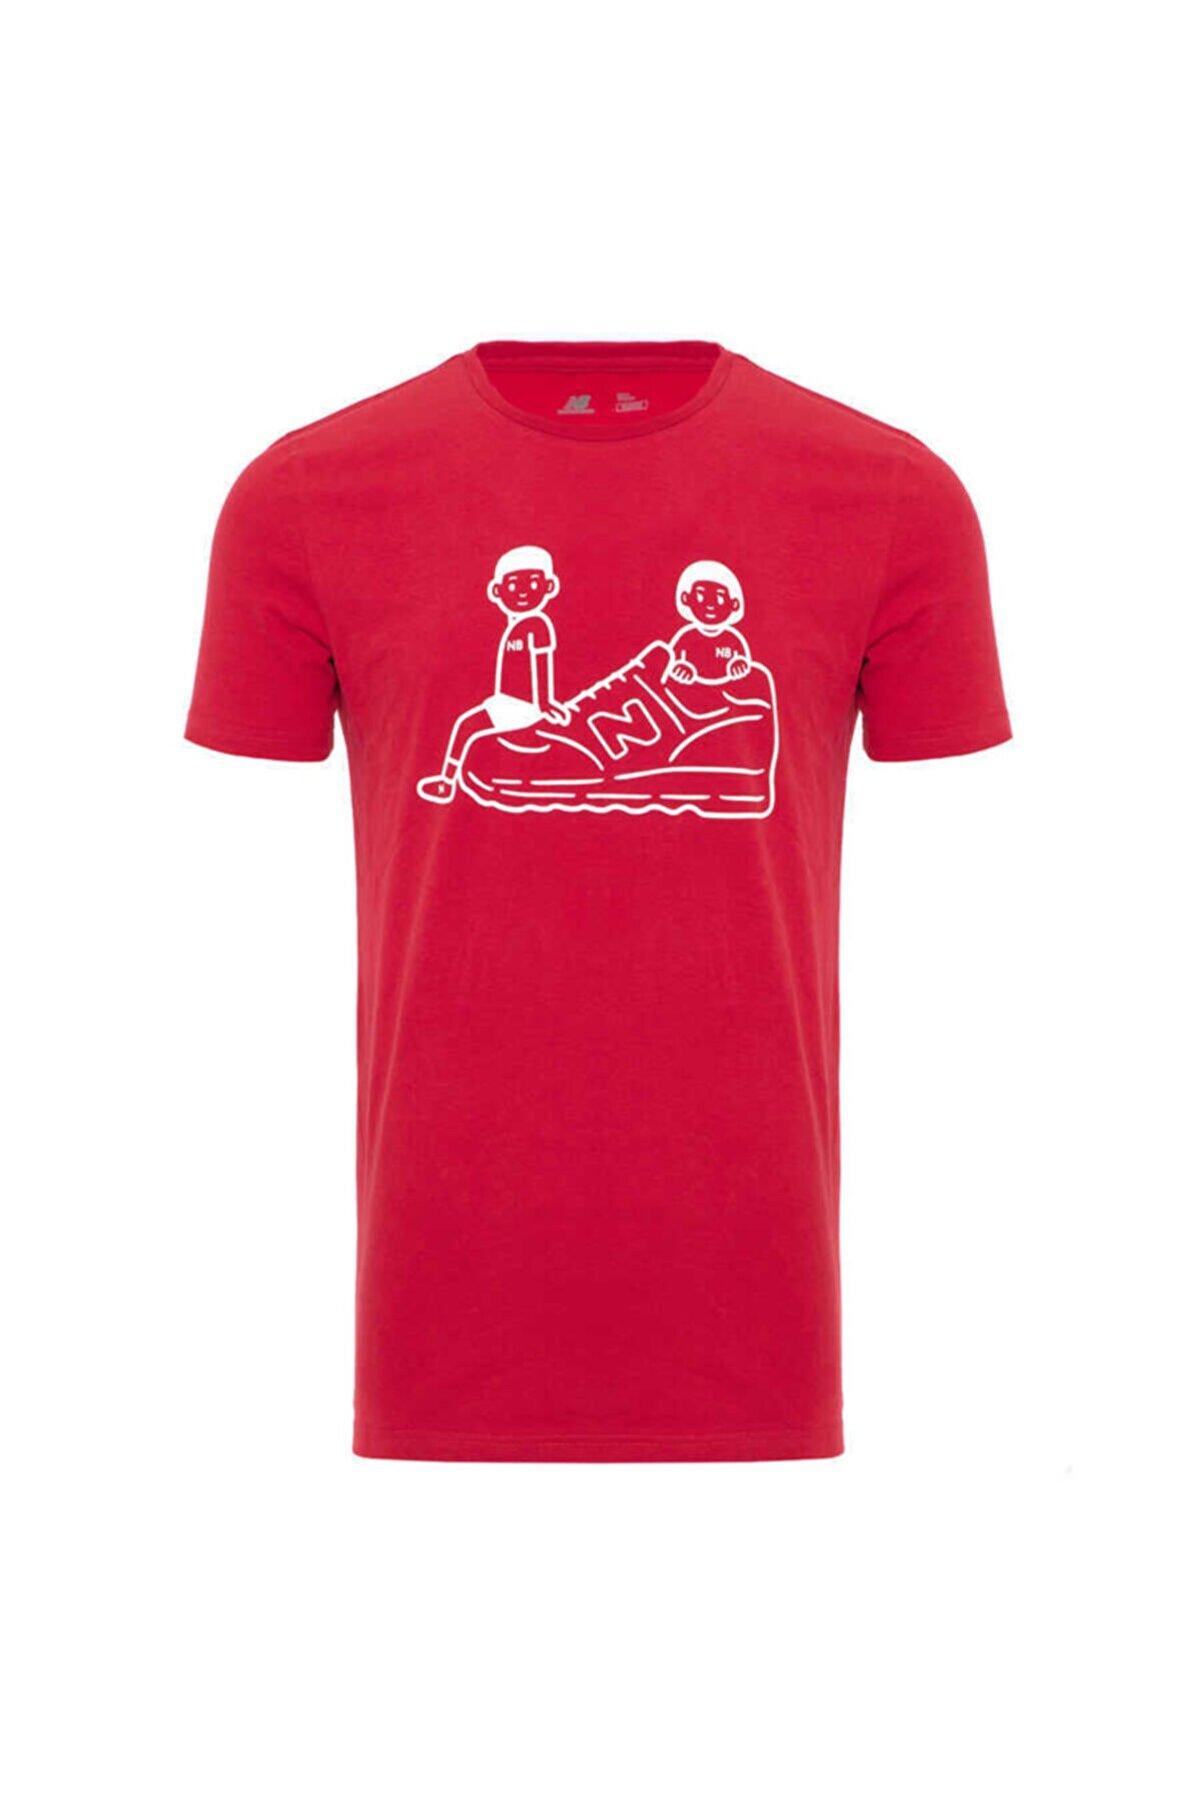 New Balance Erkek  Kırmızı T-Shirt